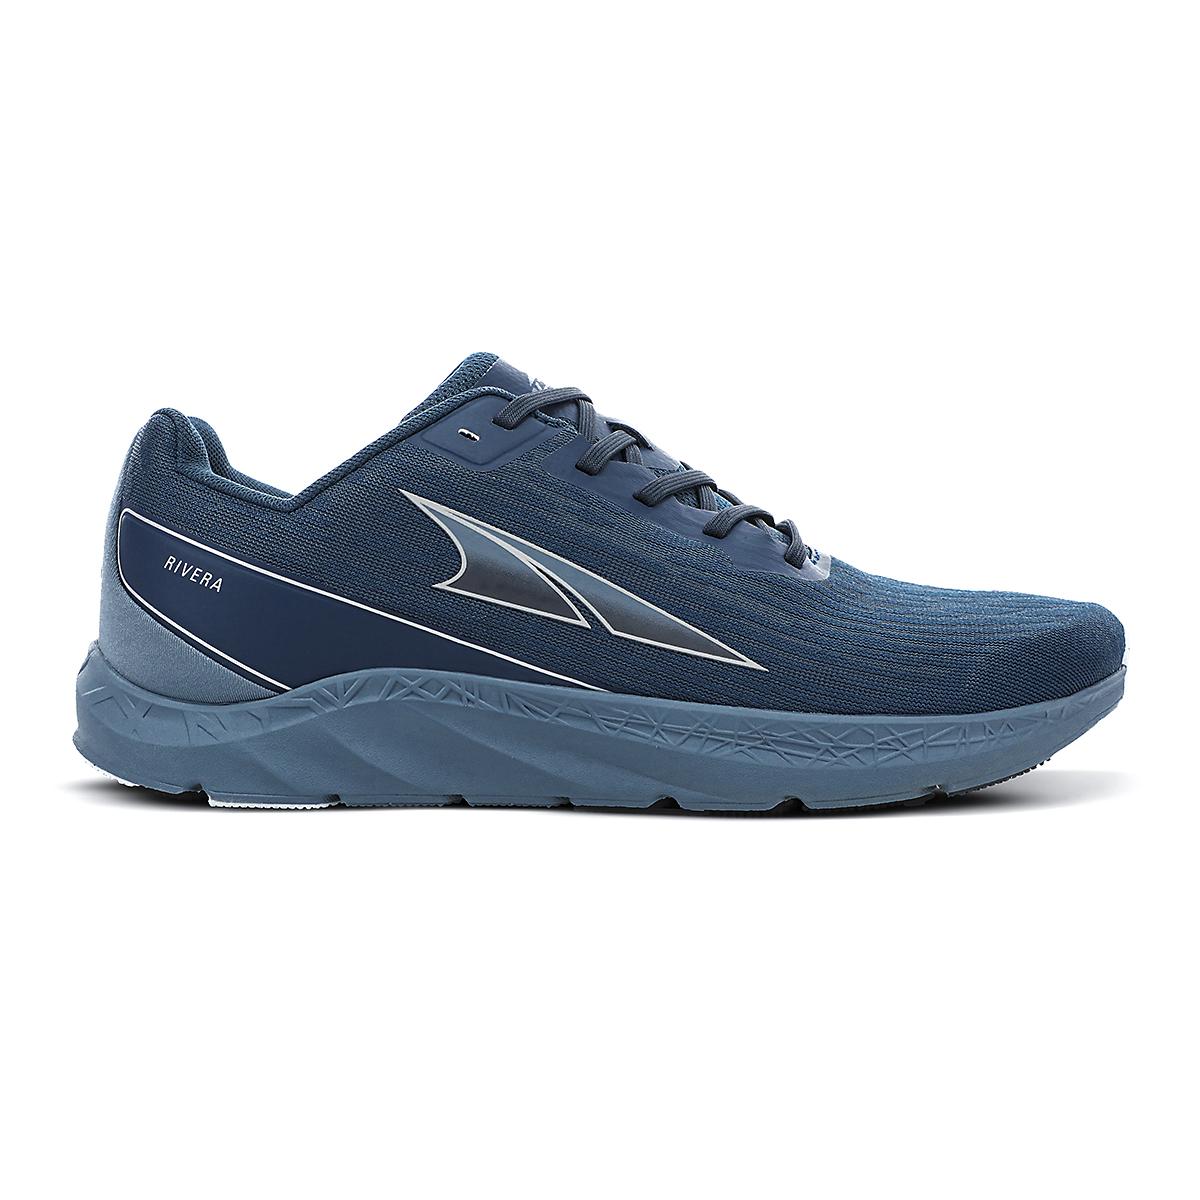 Men's Altra Rivera Running Shoe - Color: Majolica Blue - Size: 7 - Width: Regular, Majolica Blue, large, image 1